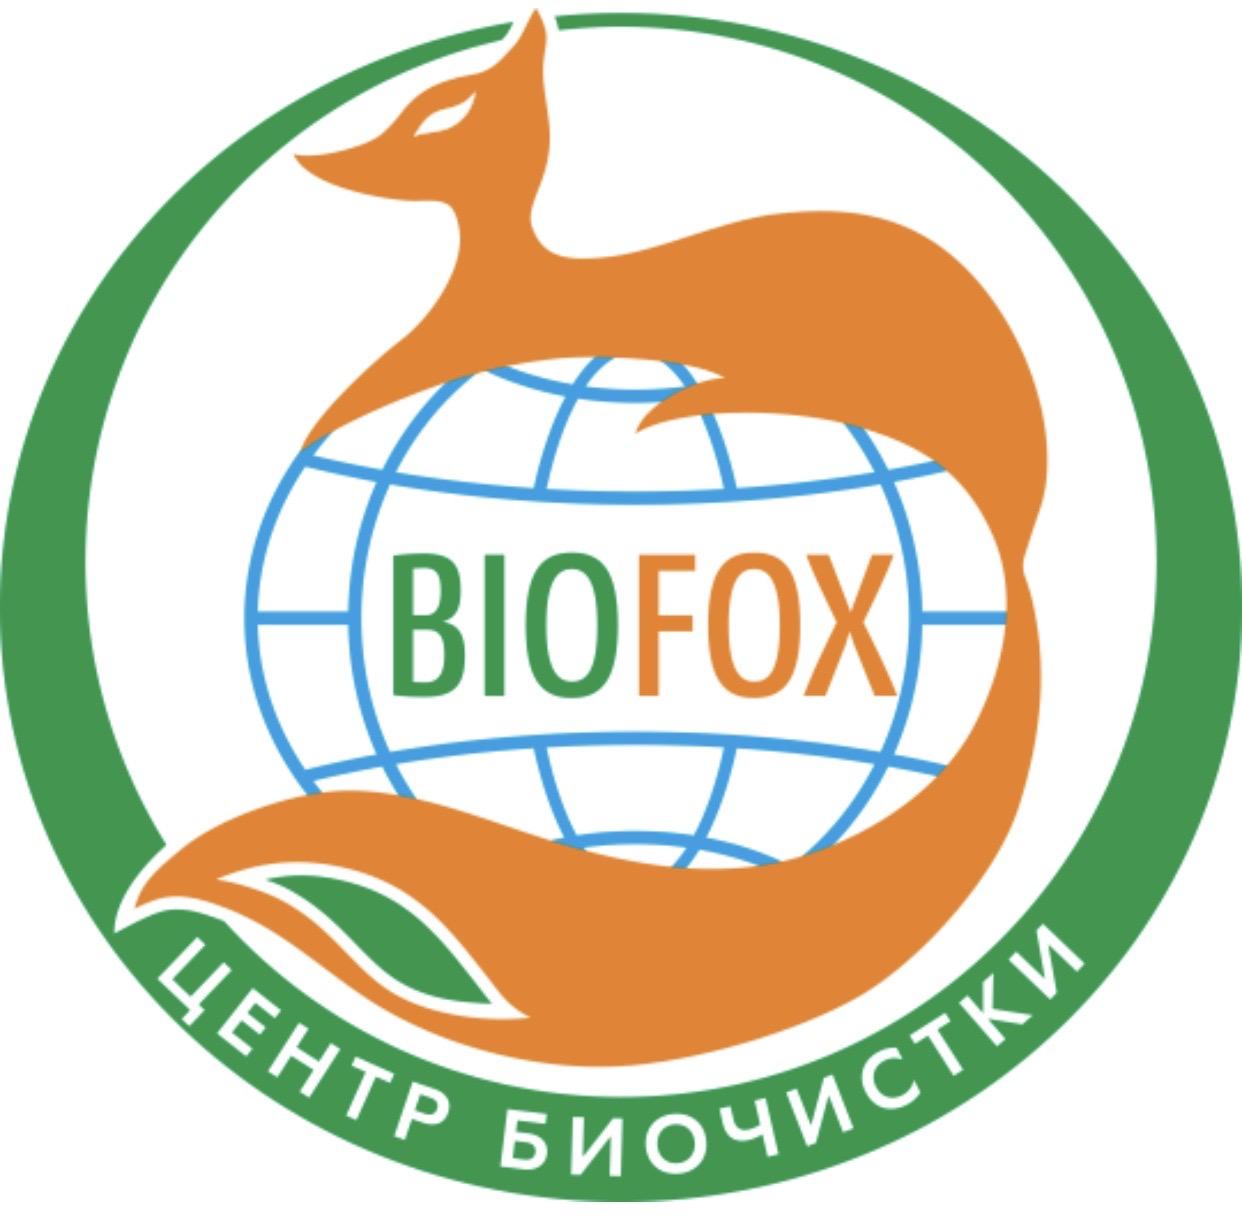 "Ручная чистка обуви от 10 руб. в центре биочистки ""Biofox"" в Бресте"